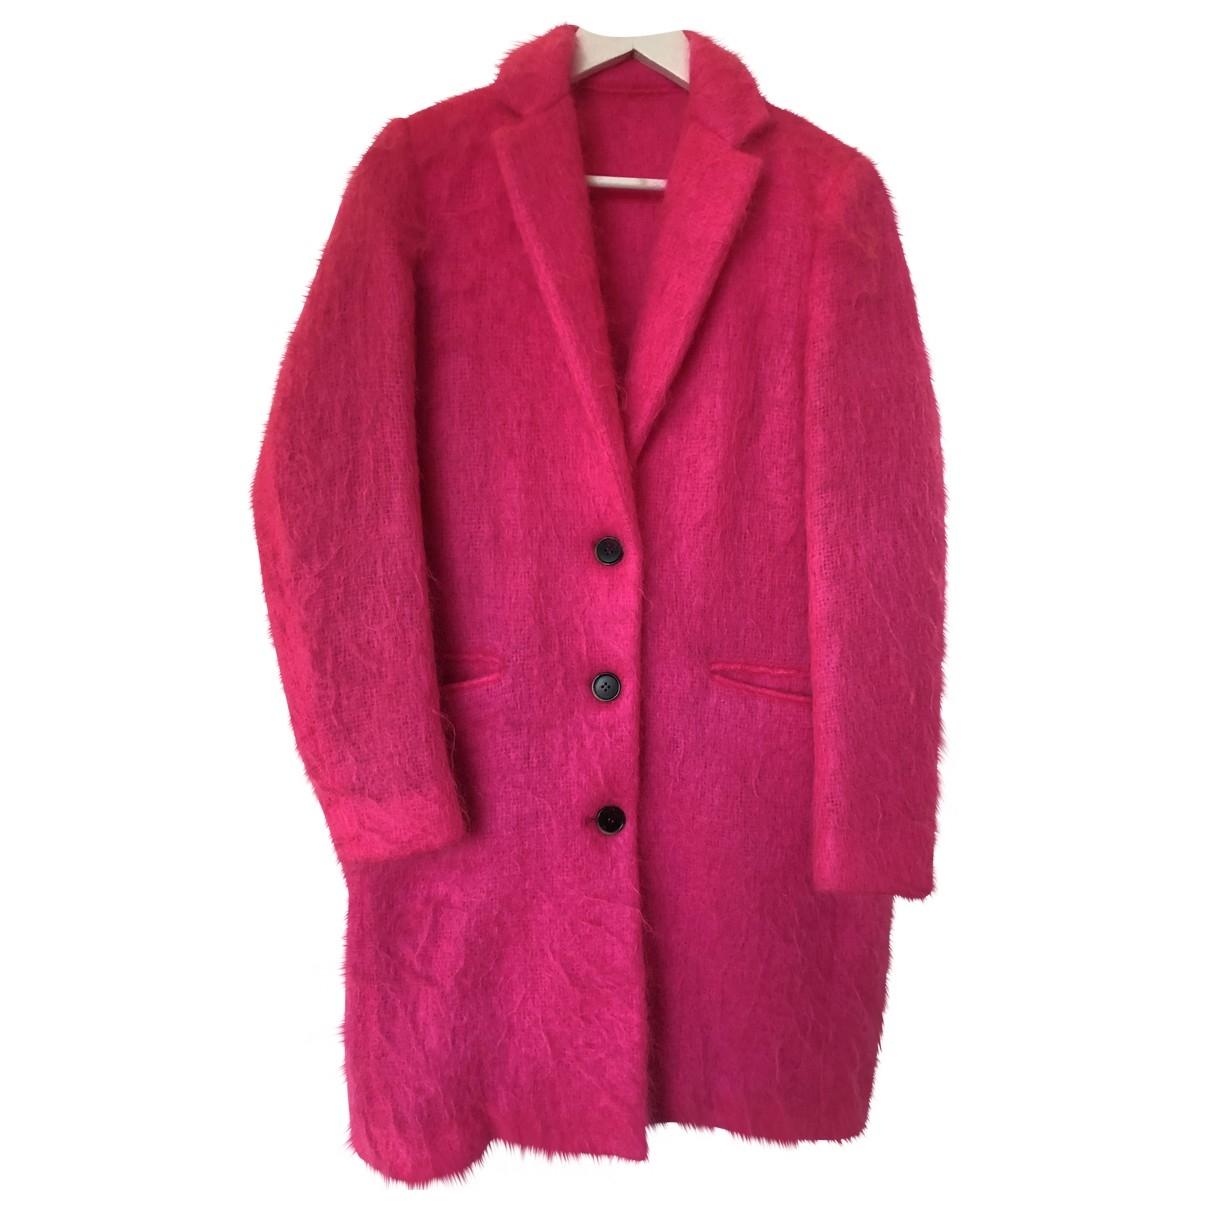 Msgm \N Pink Wool coat for Women 40 IT